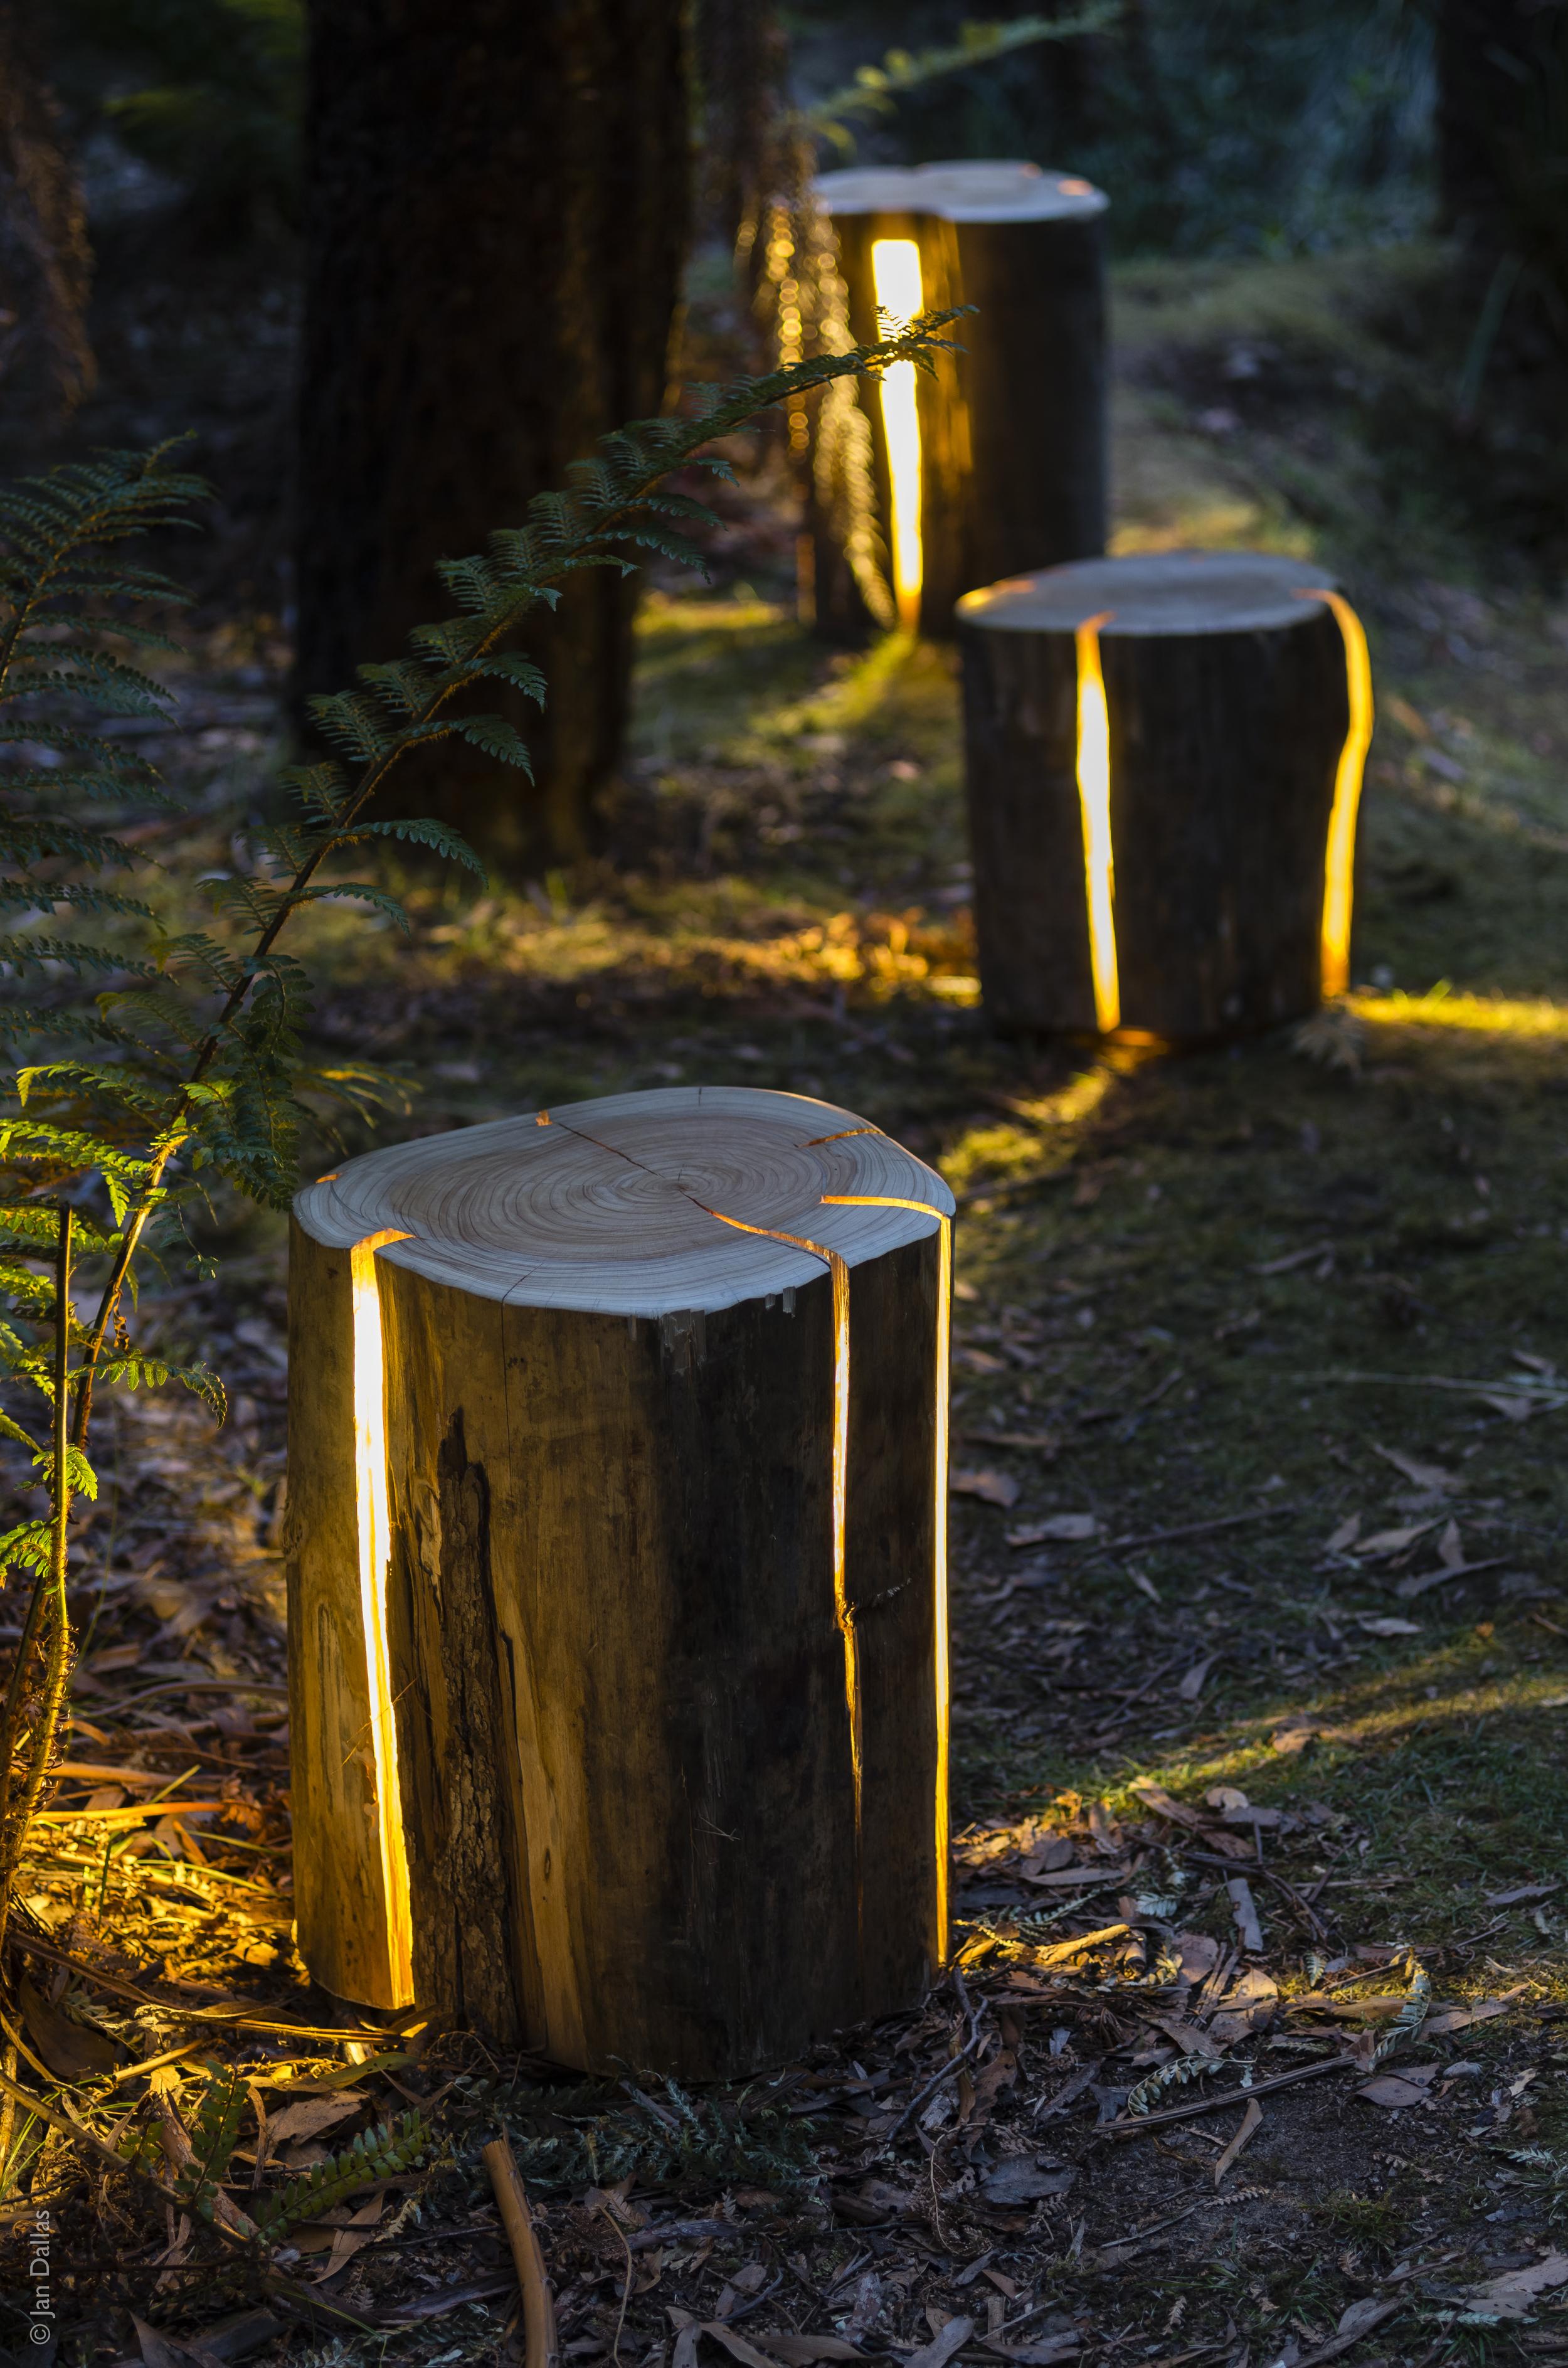 LAMP2-STUMP-DuncanMeerding-photoJanDallas1.jpg